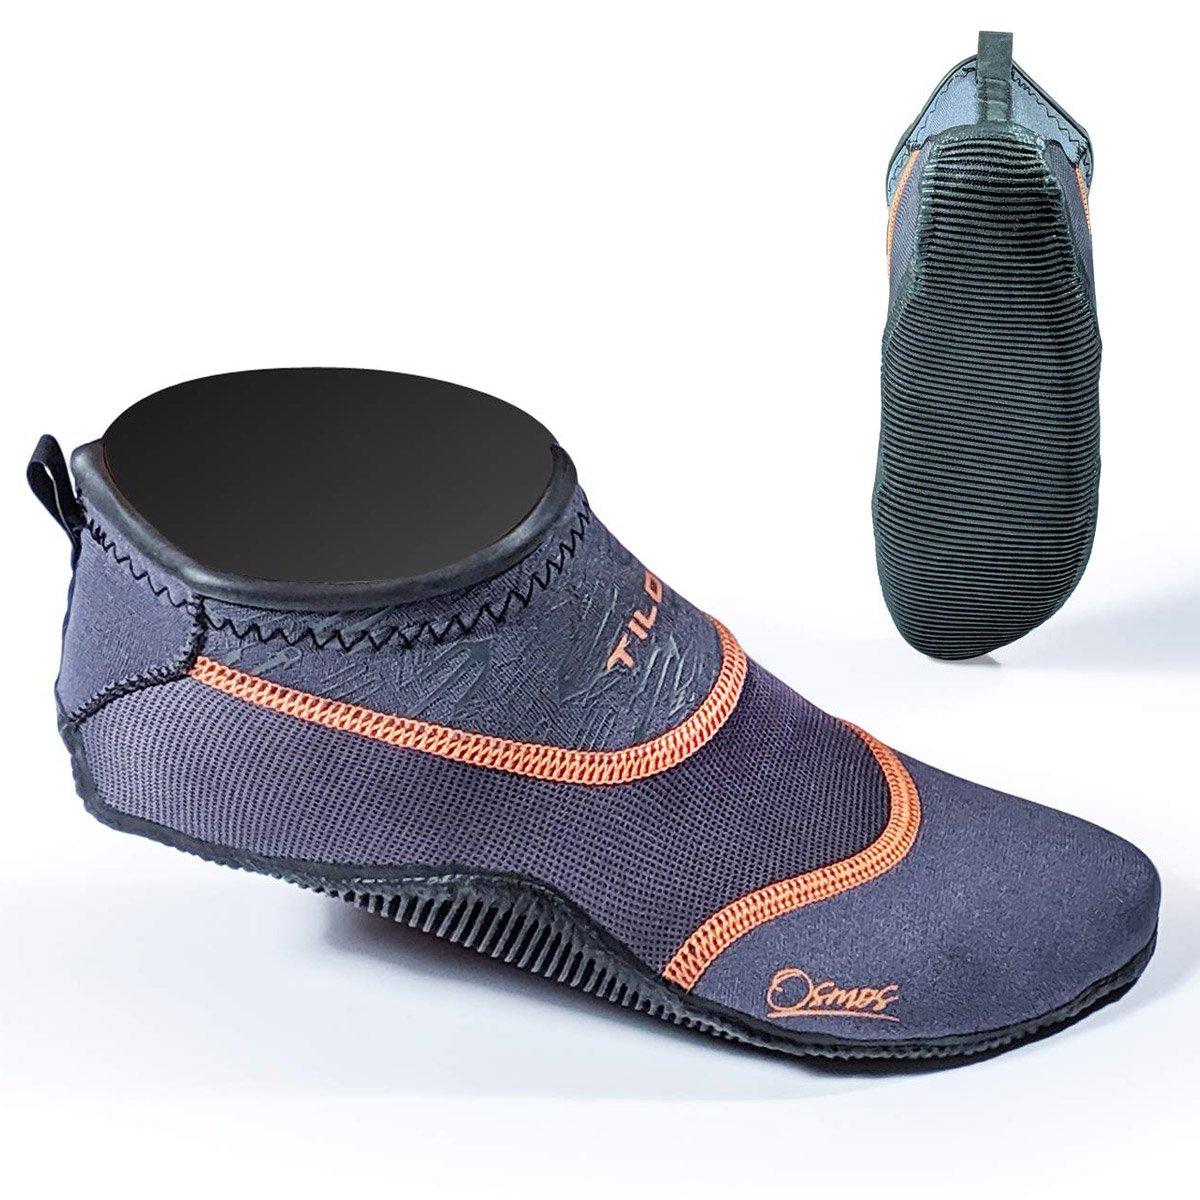 Tilos 1.5mm Osmos Sock